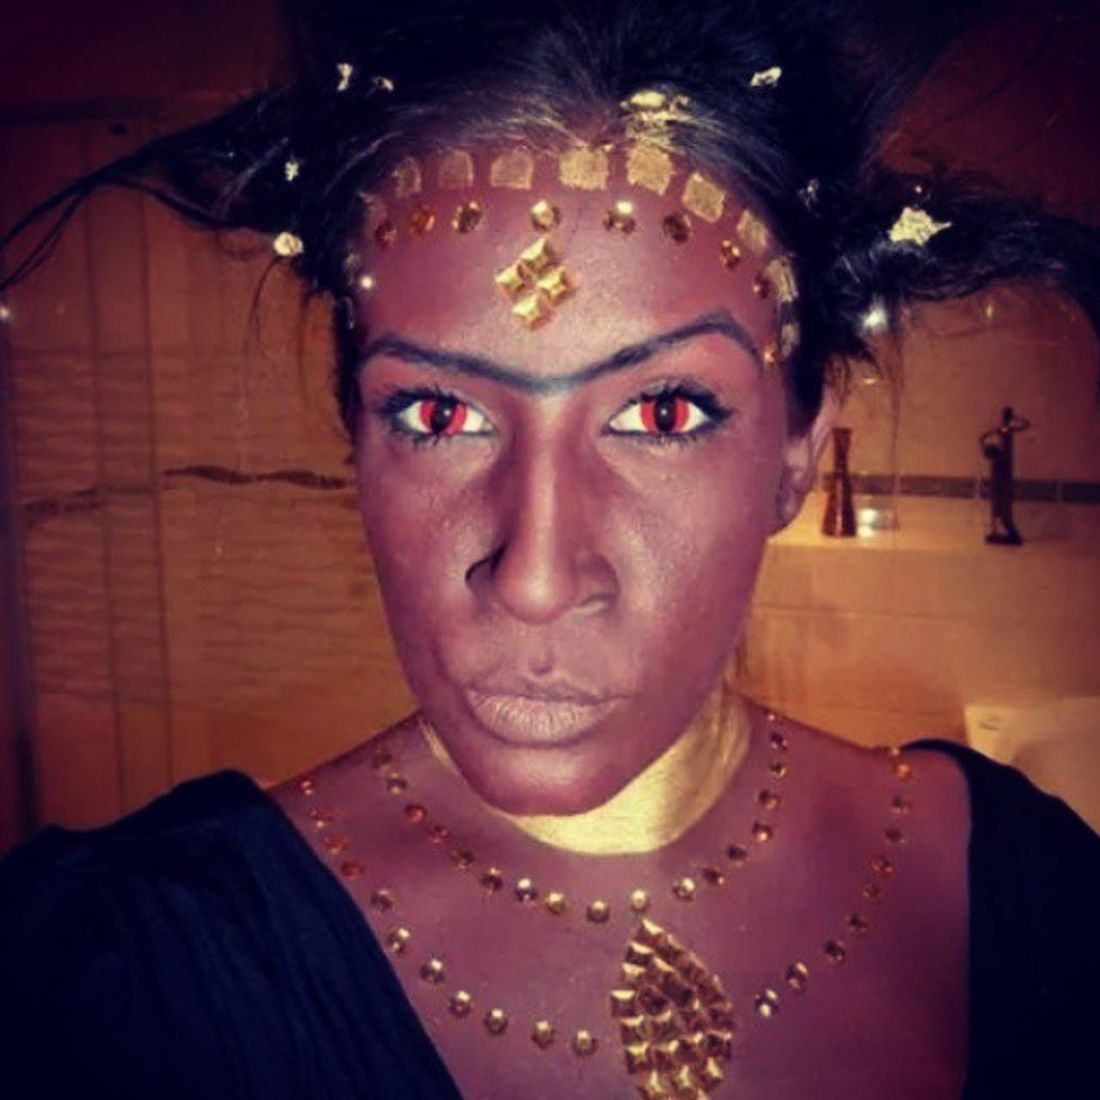 Halloween Karaba Sorcière Kirikou witch transformation dark darkmakeup karabalasorciere makeup makeupartist maquillage cpl coupdepinceaudelilly